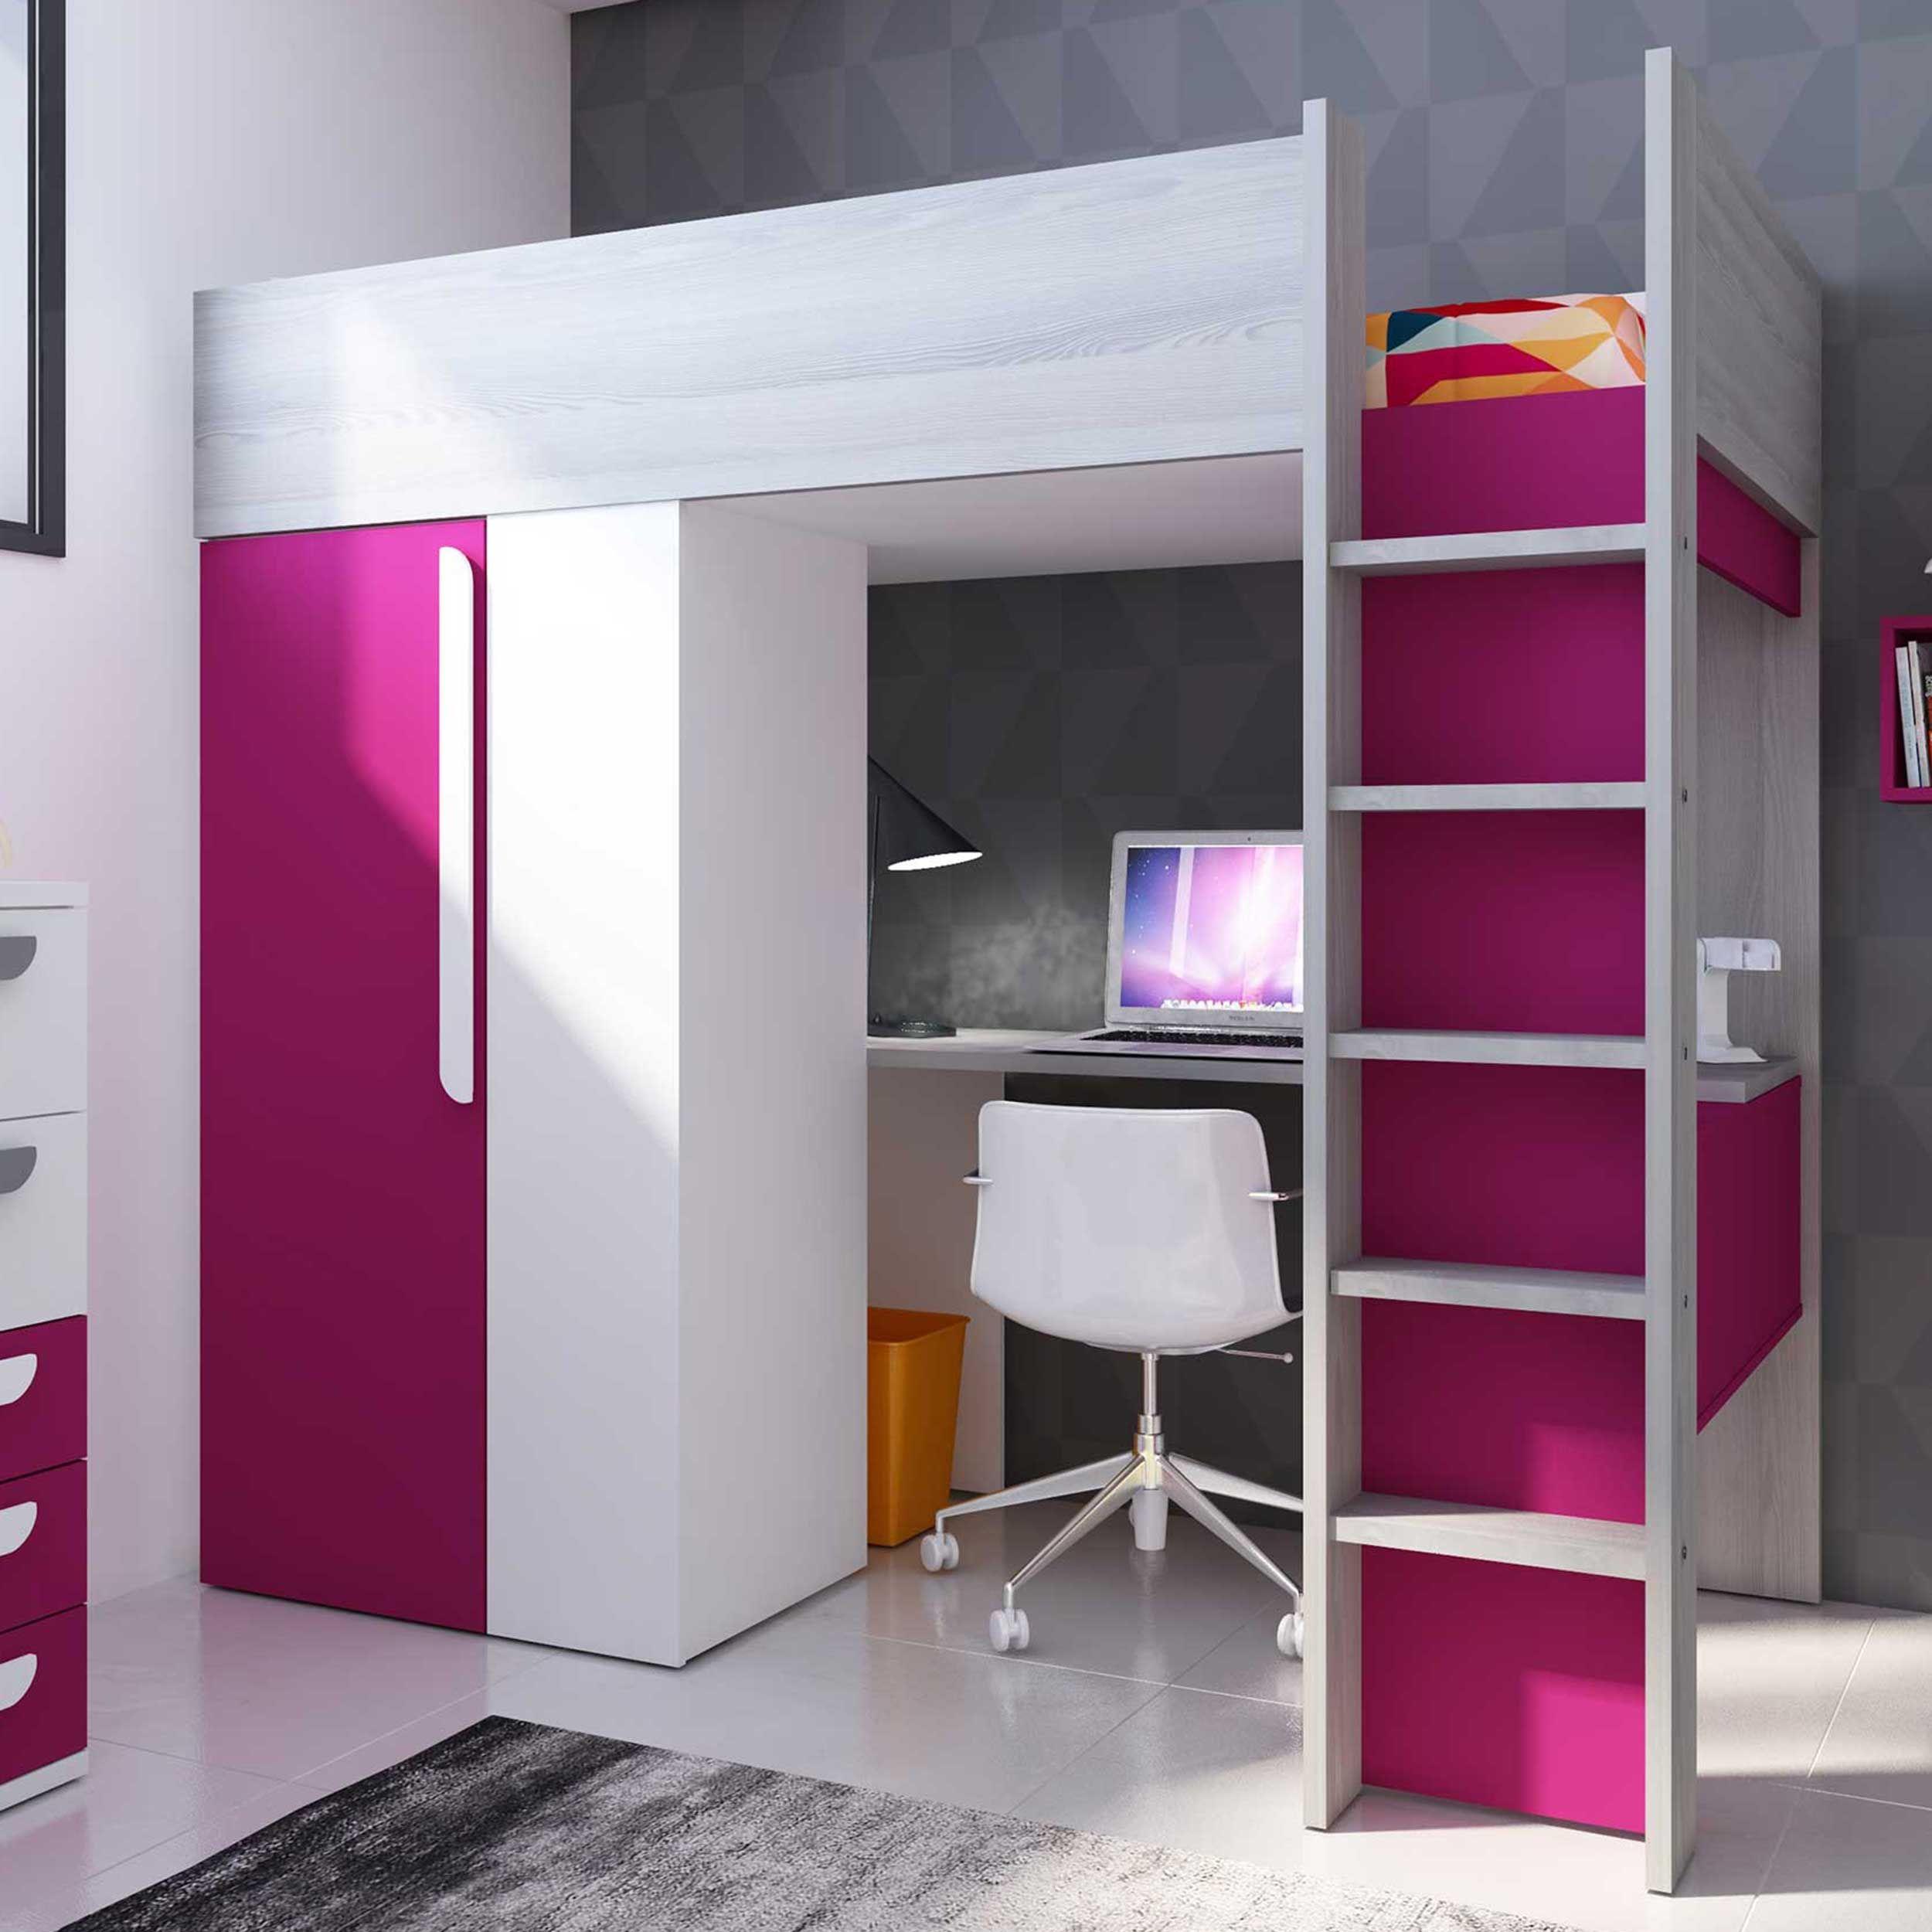 lit mezzanine beau avec bureau et armoire fuchsia